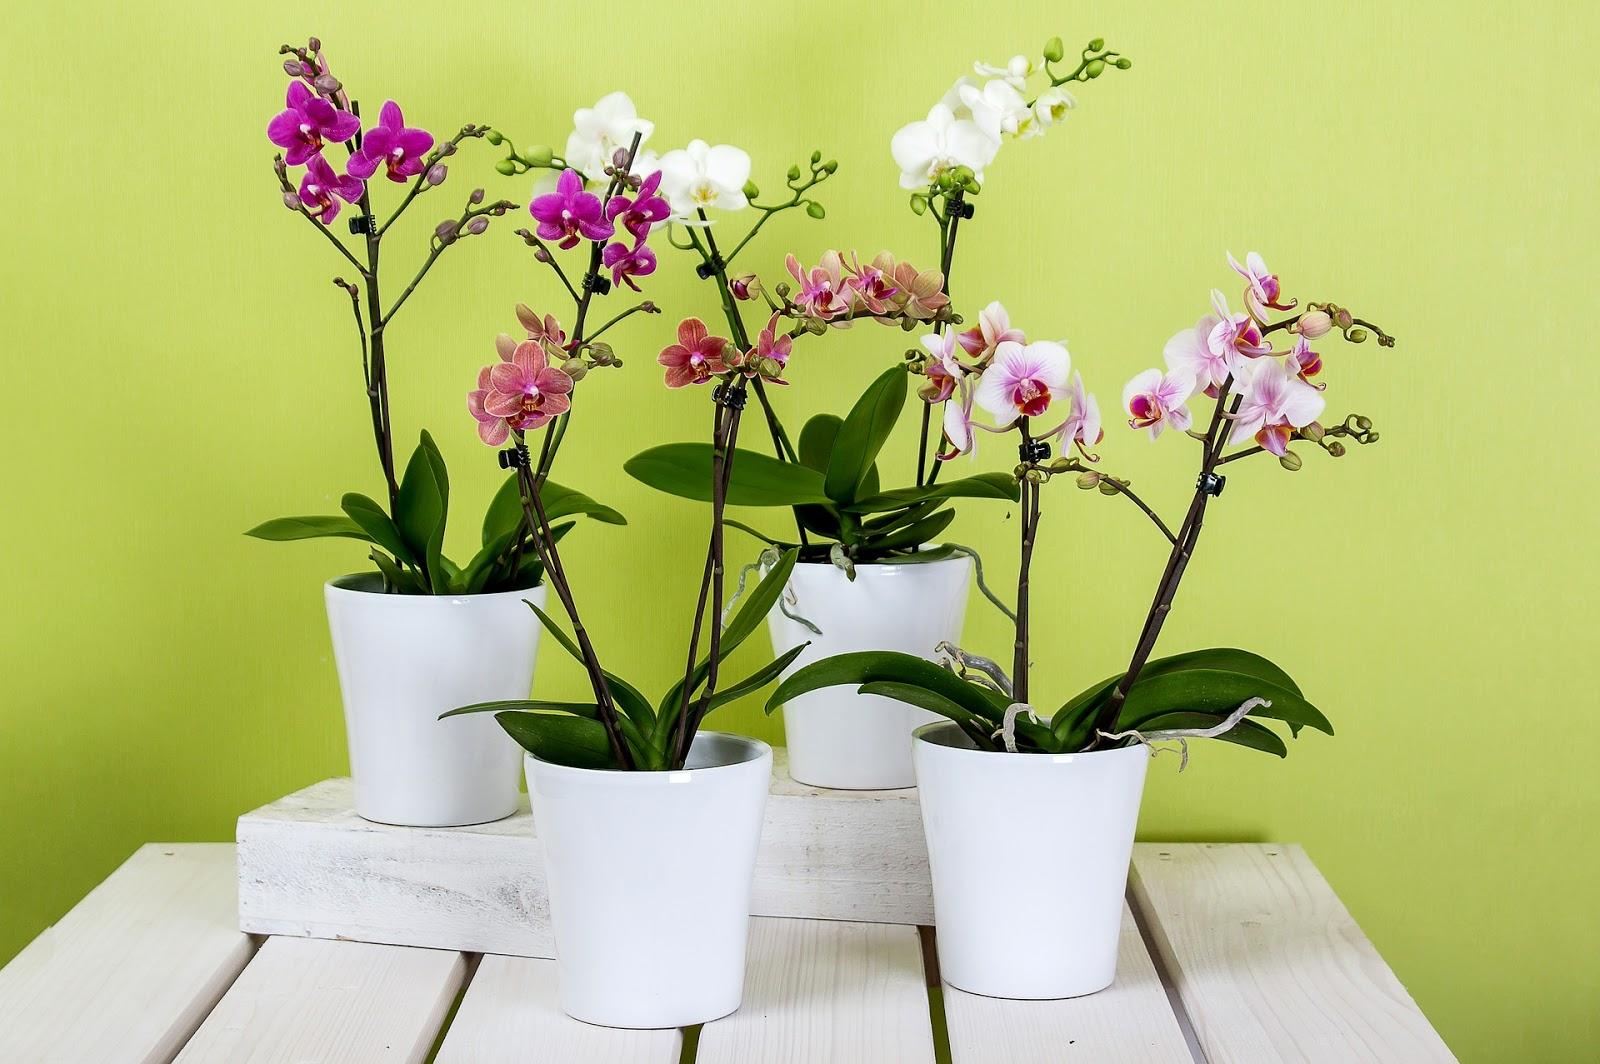 Gambar bunga anggrek dalam pot